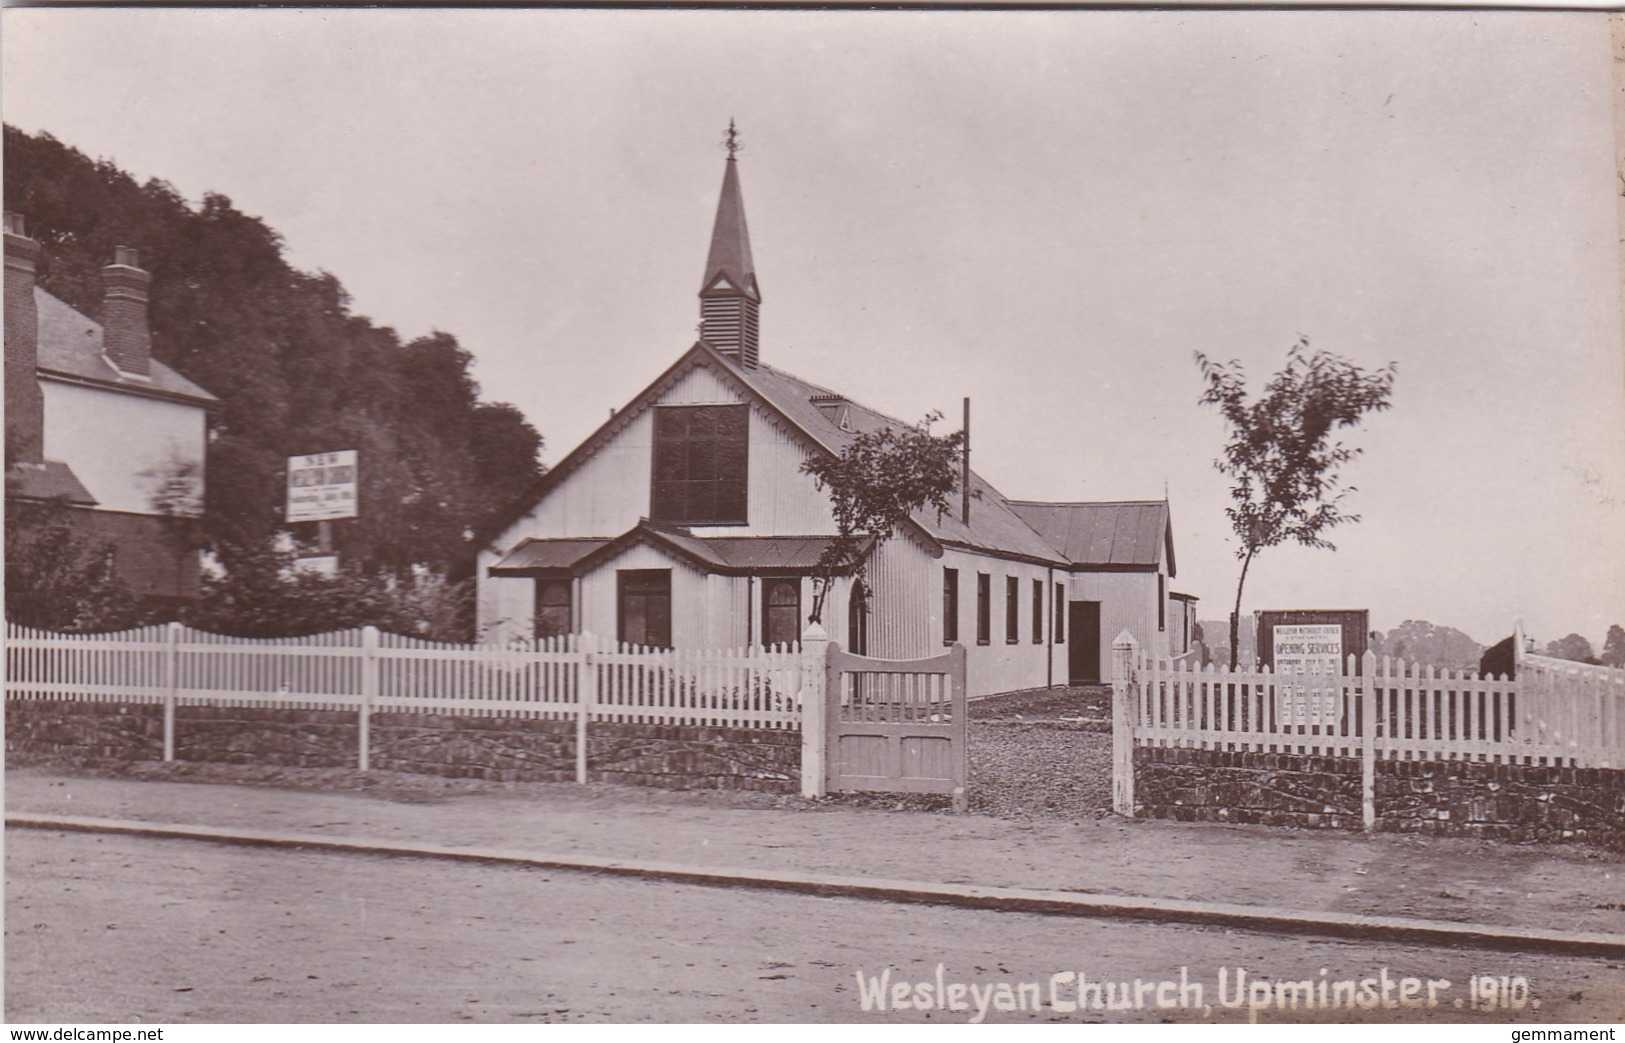 UPMINSTER - WESLEYAN CHURCH - London Suburbs